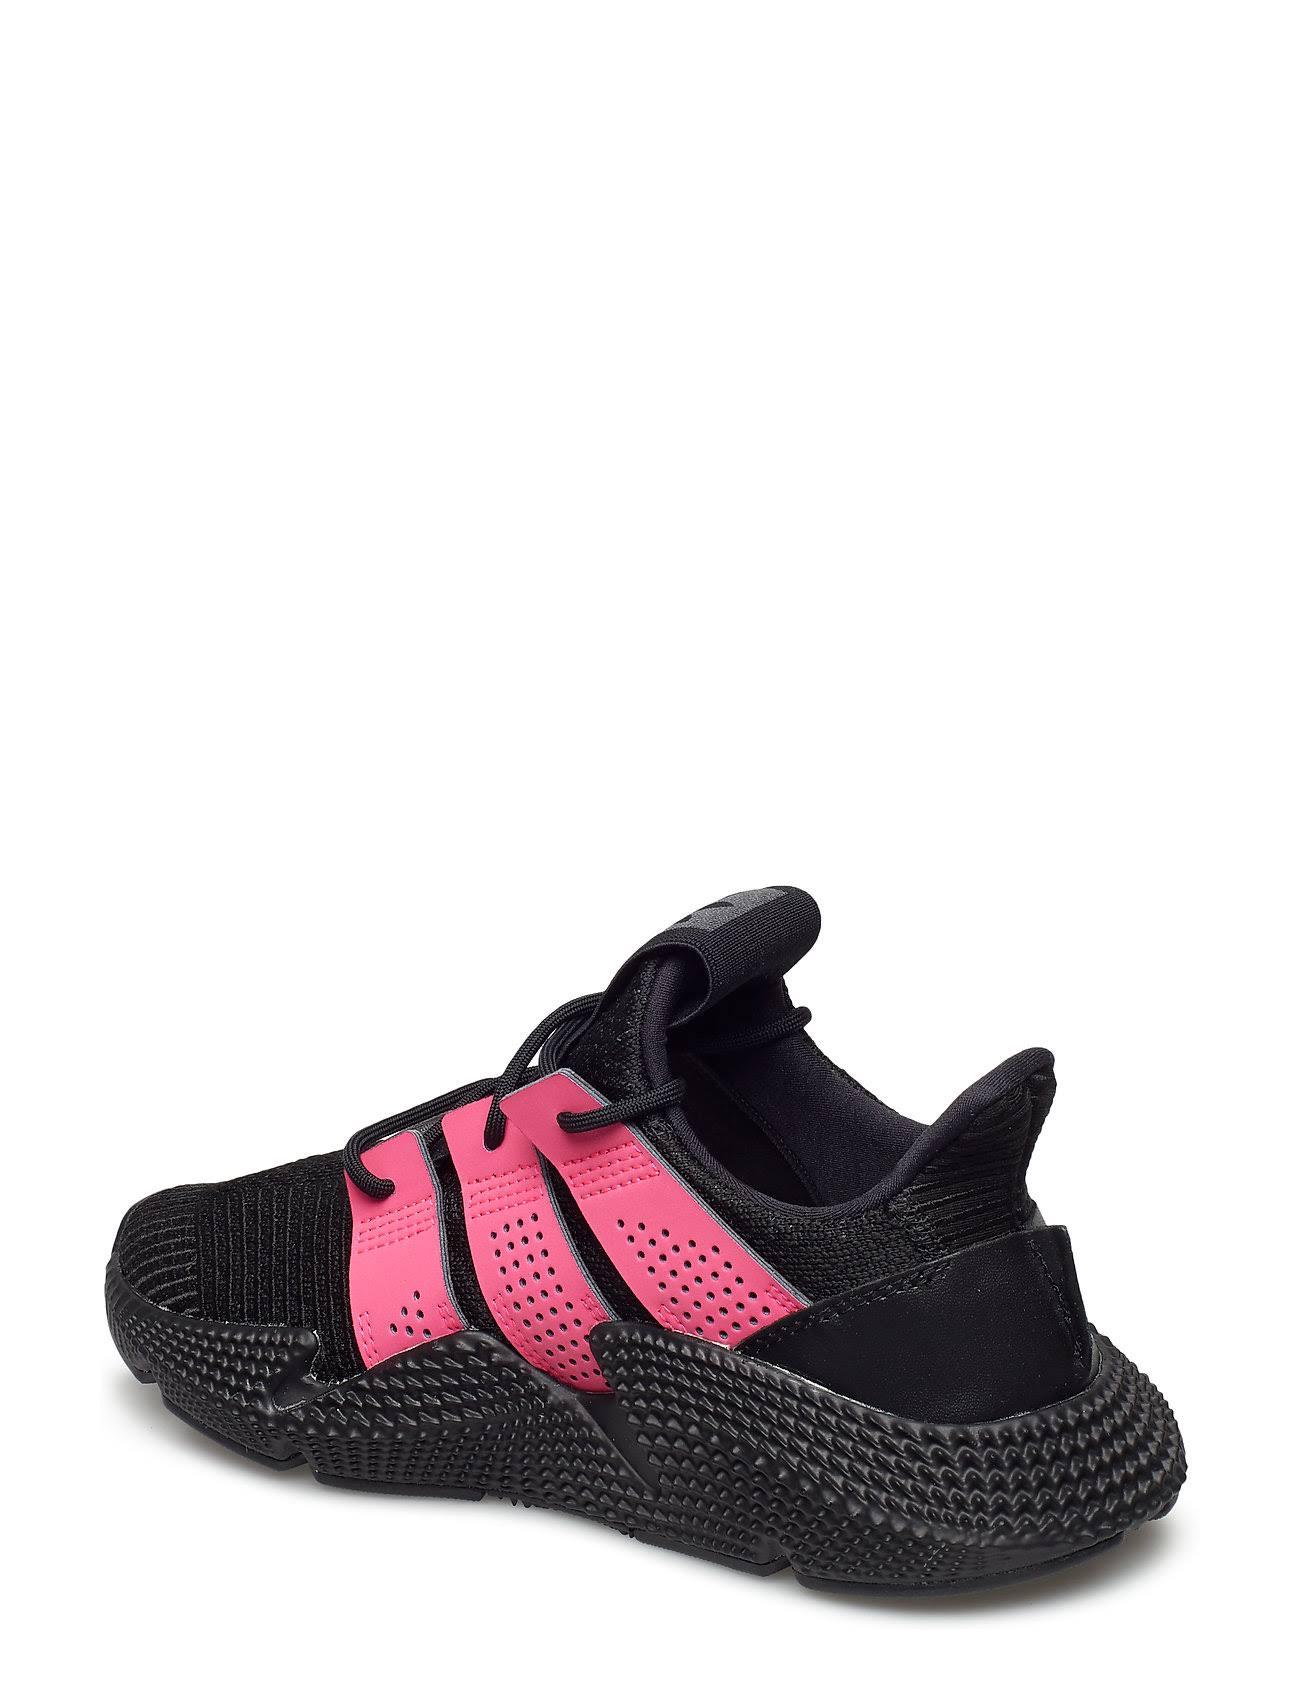 Adidas W SneakersdameCblackShopnk Carbon Prophere Lage MVpqGLzSU